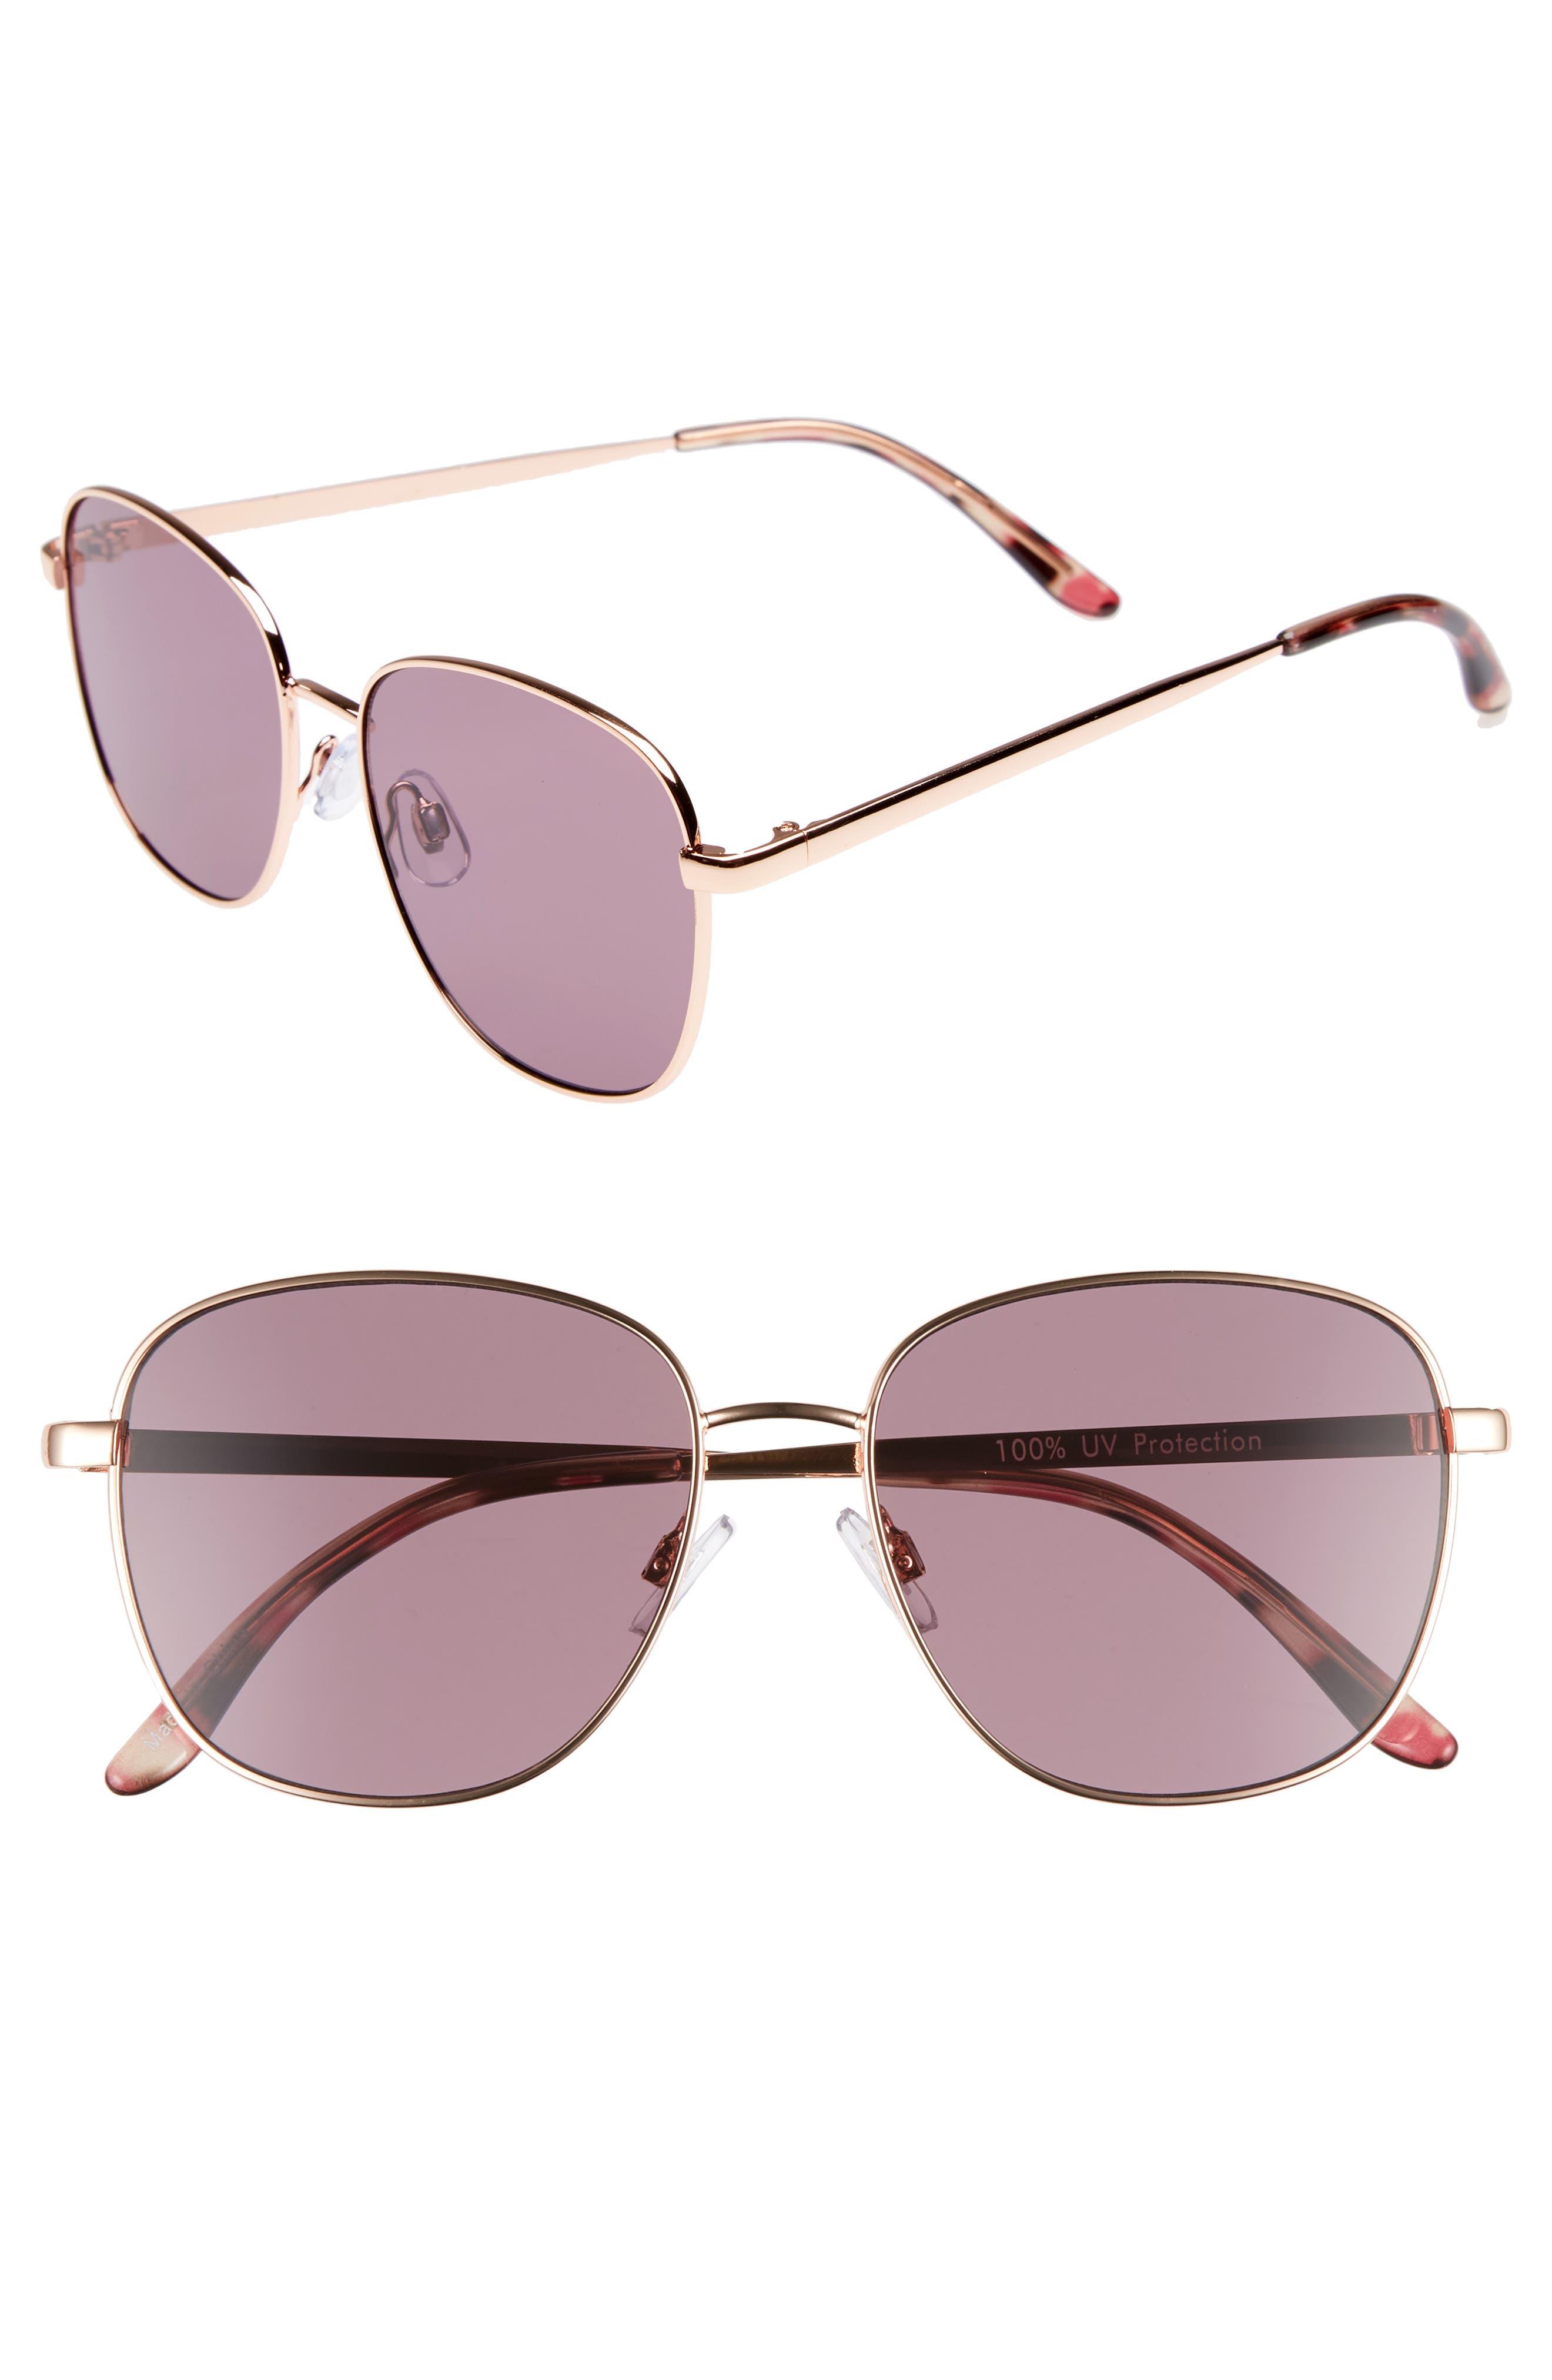 Main Image - BP. 53mm Square Sunglasses